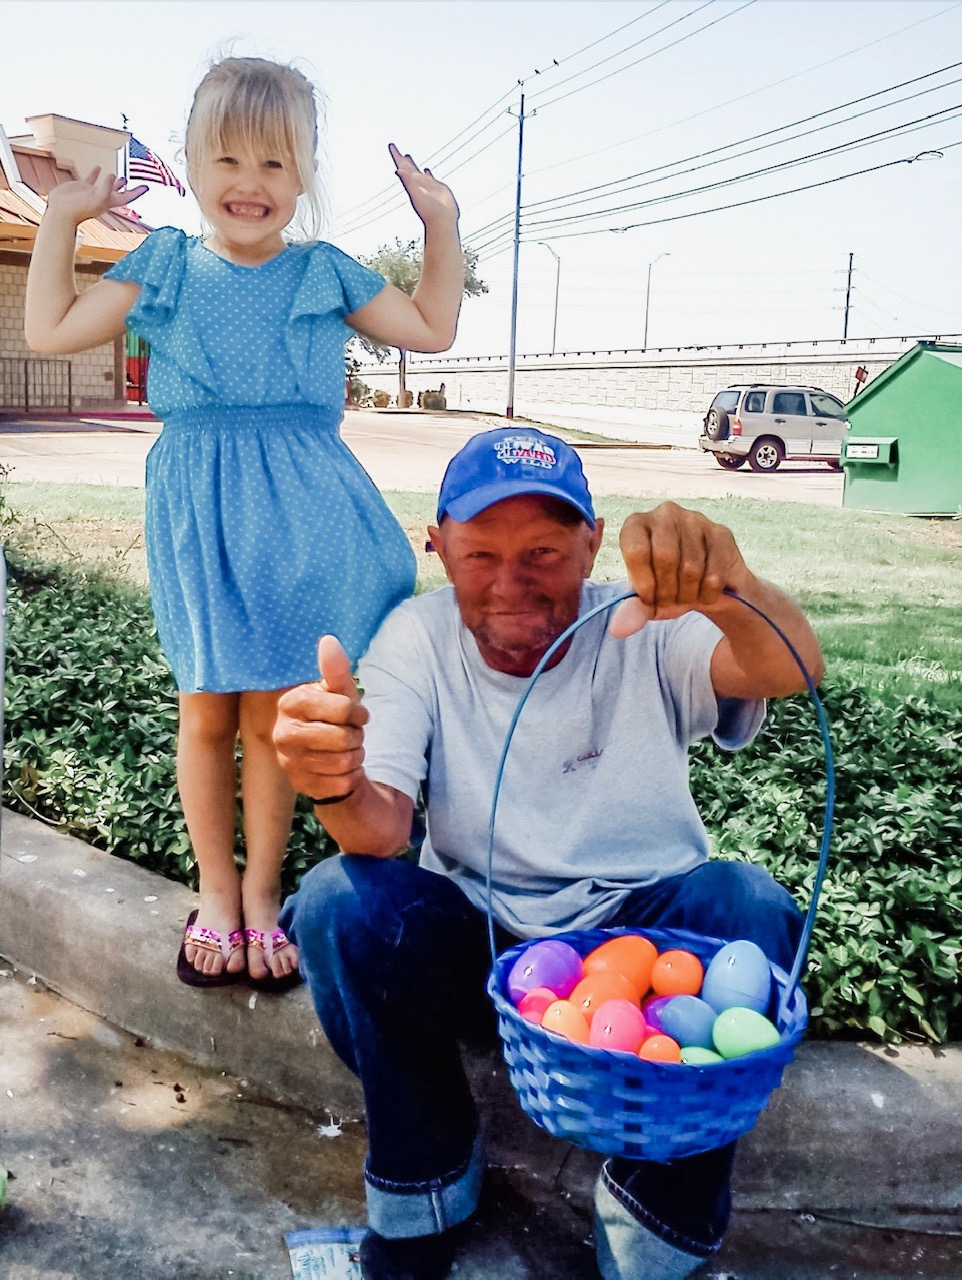 the Easter egg hunt!